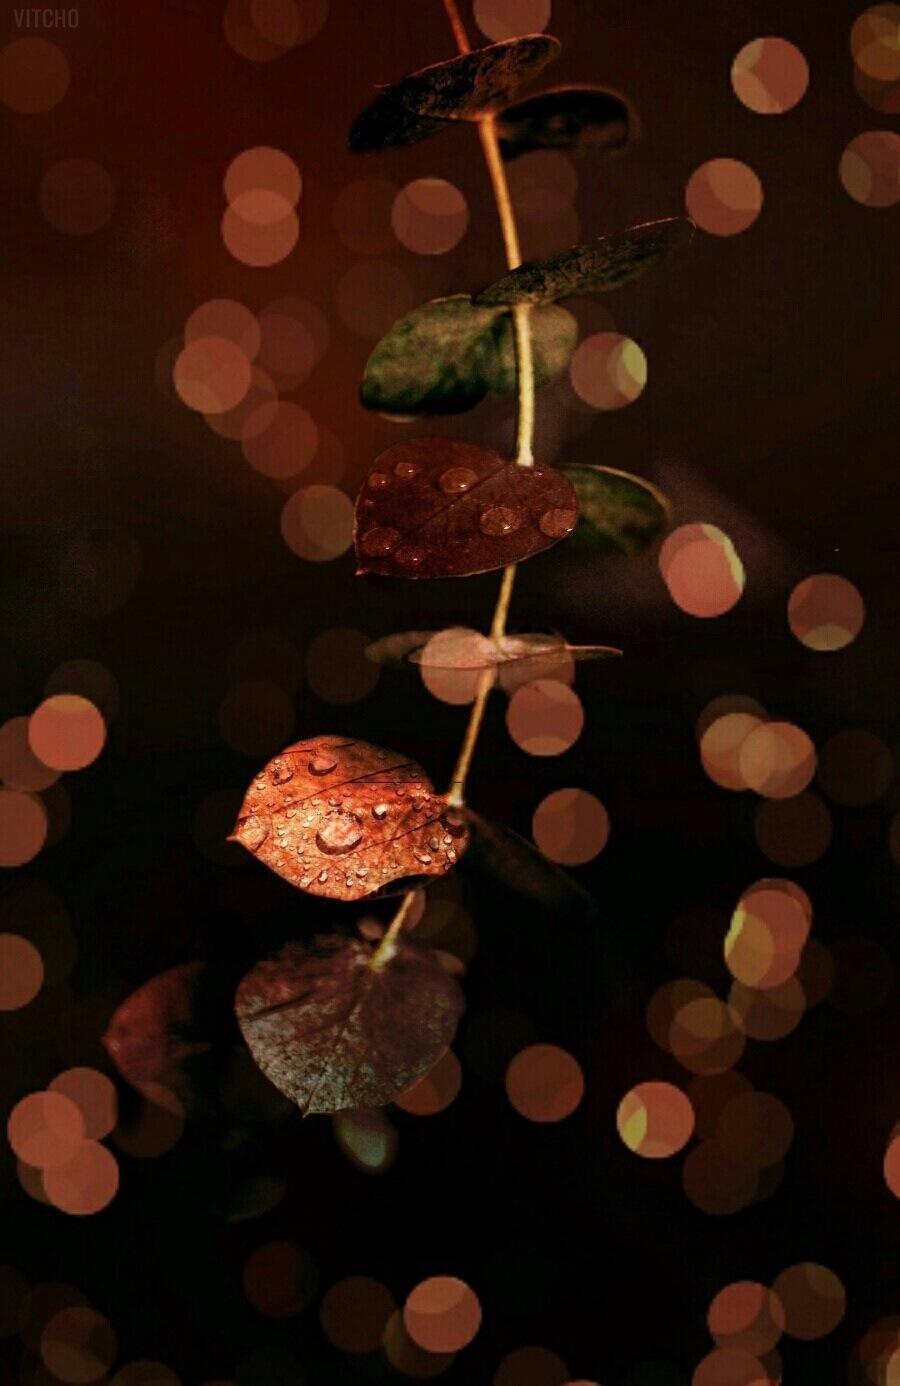 Untitled by Bouchareb Karim